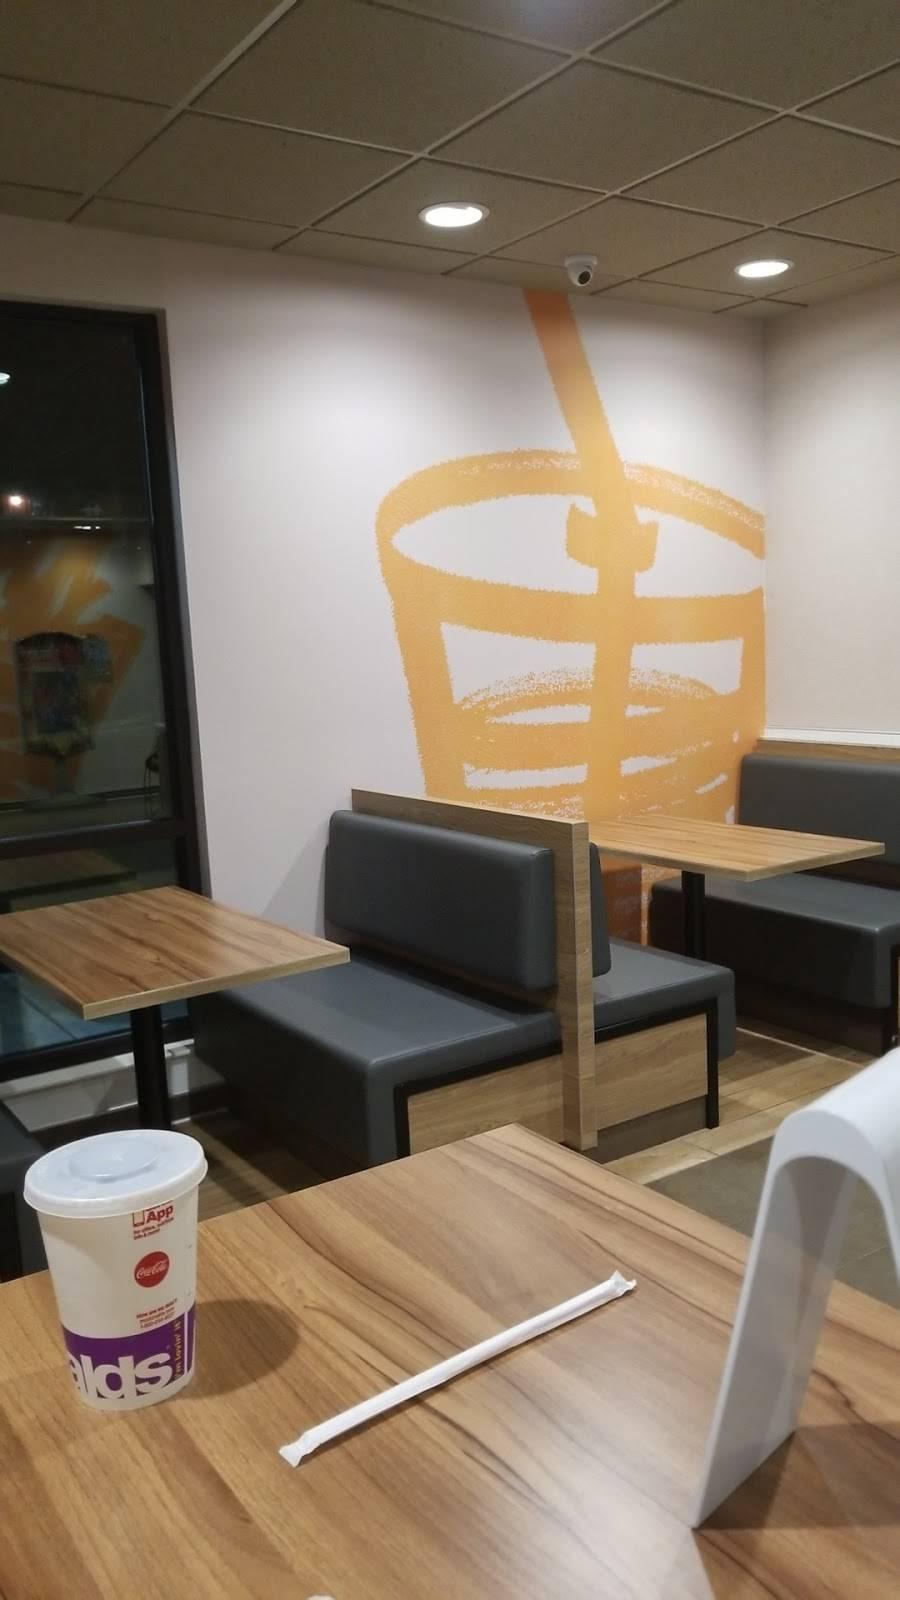 McDonalds | cafe | 15 NE Median St, Chehalis, WA 98532, USA | 3609964136 OR +1 360-996-4136